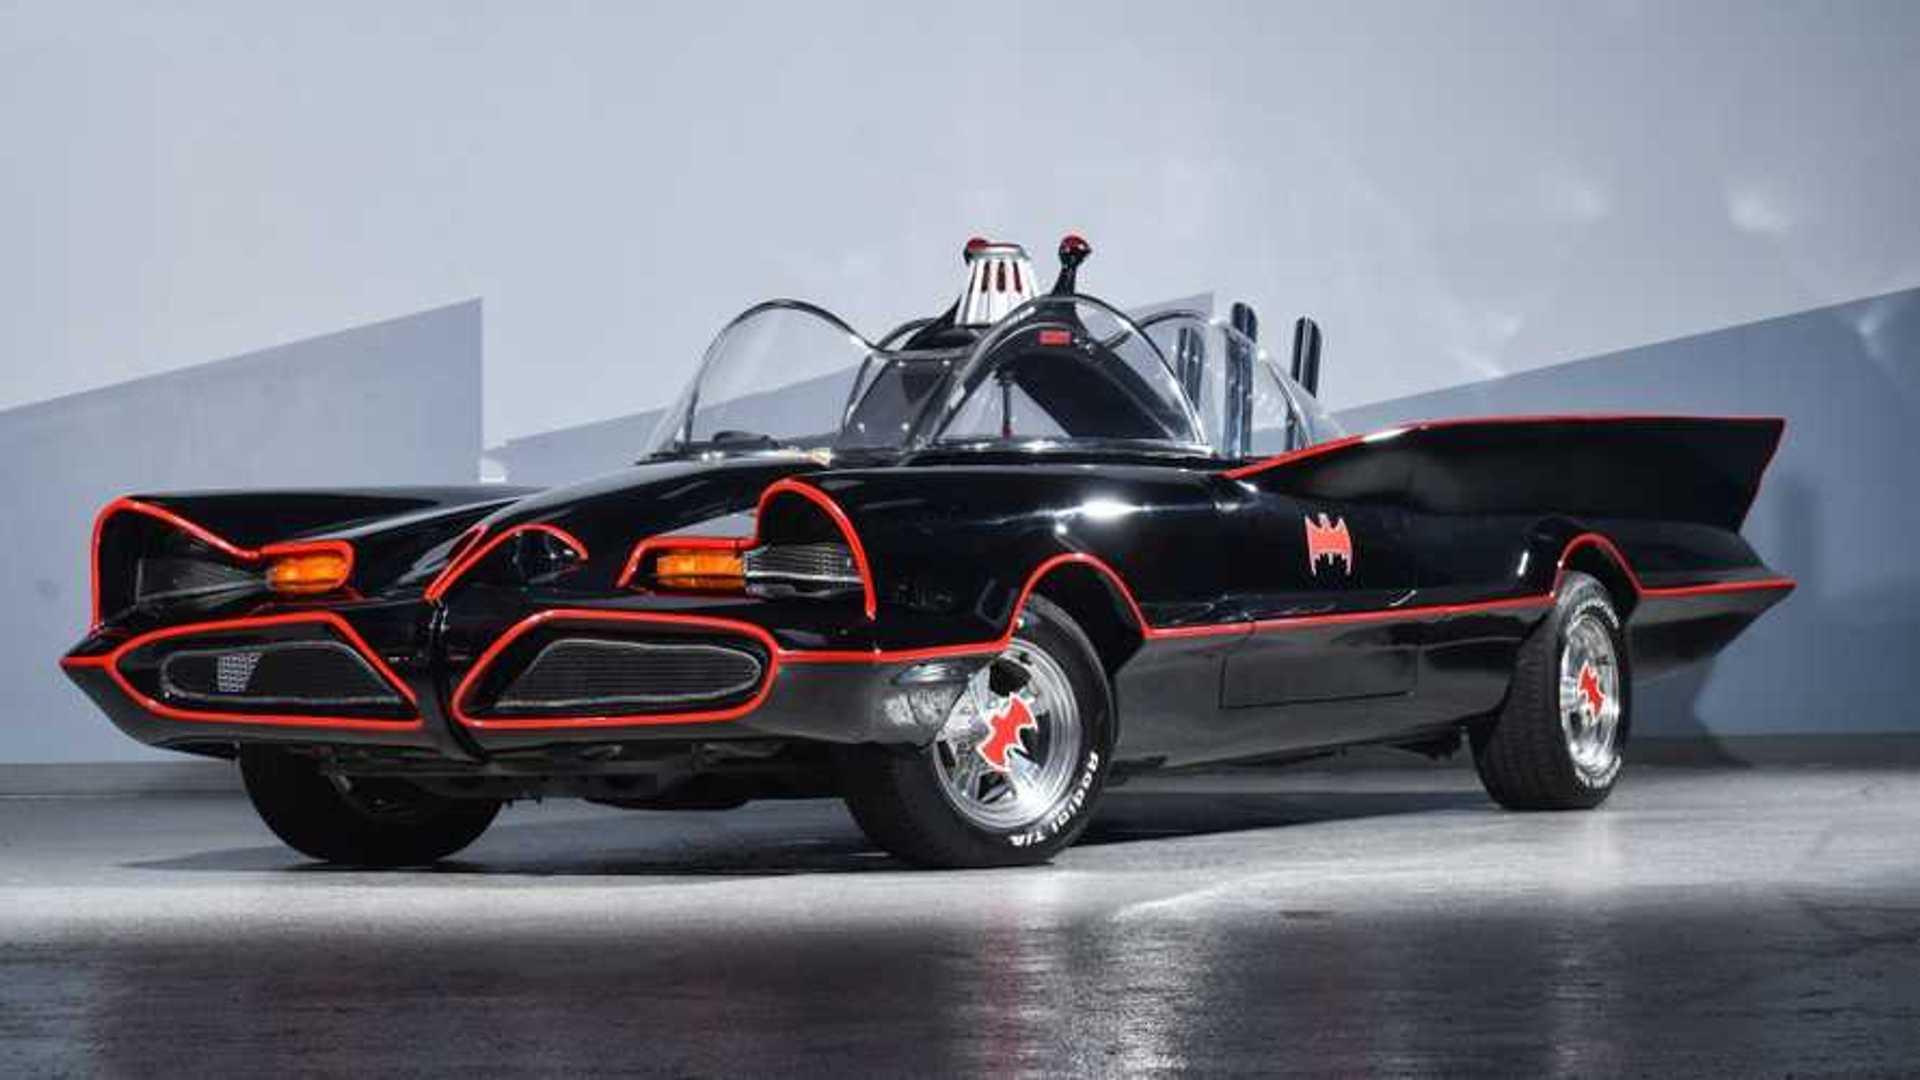 Save Gotham City In This $140K Batmobile Replica | Motorious